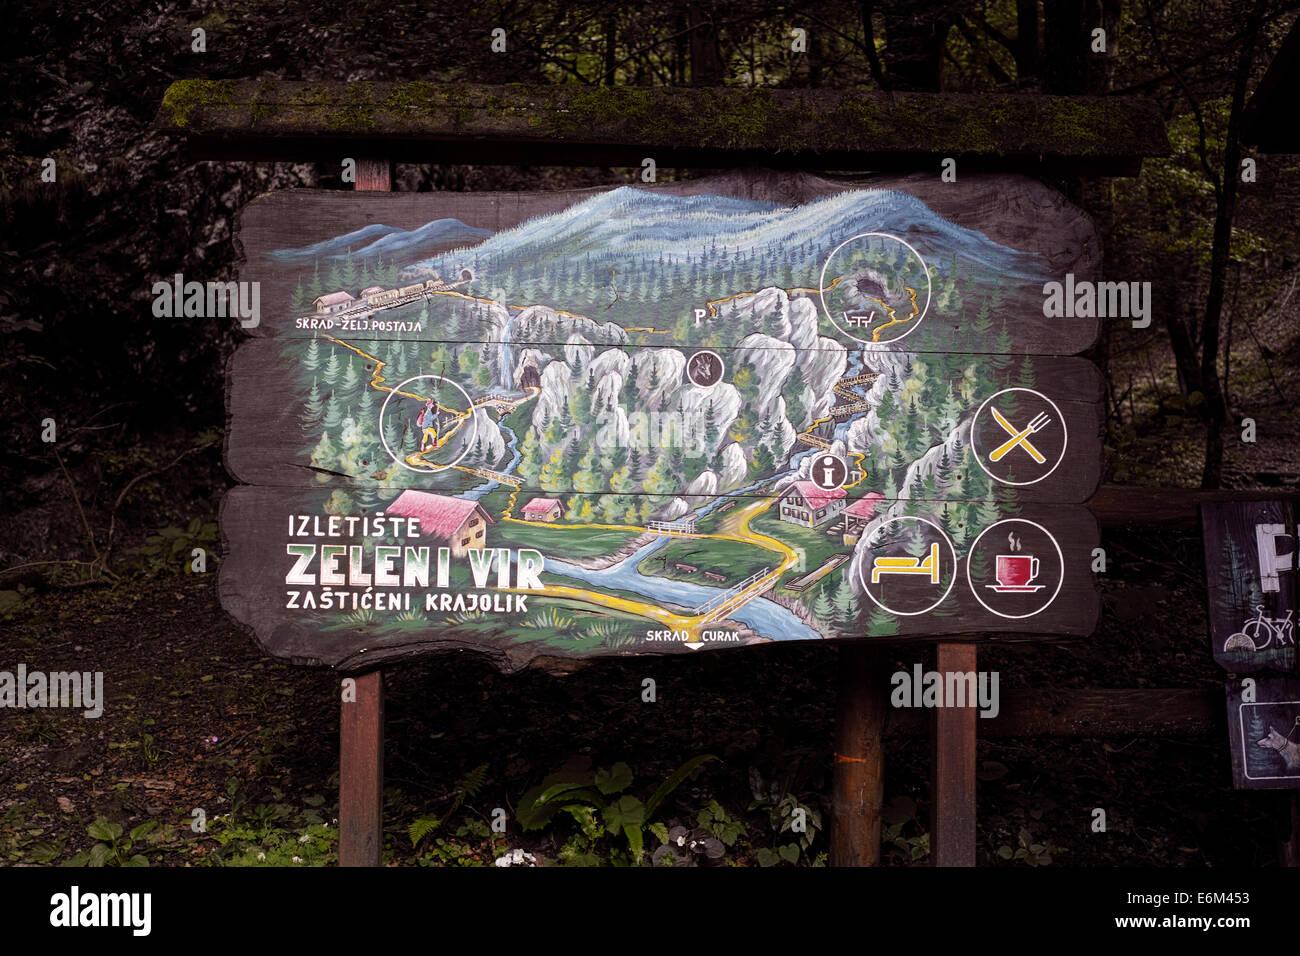 Zeleni Vir - Touristic place deep in the mountains of Gorski Kotar, Croatia, Europe. Natural wonder. - Stock Image